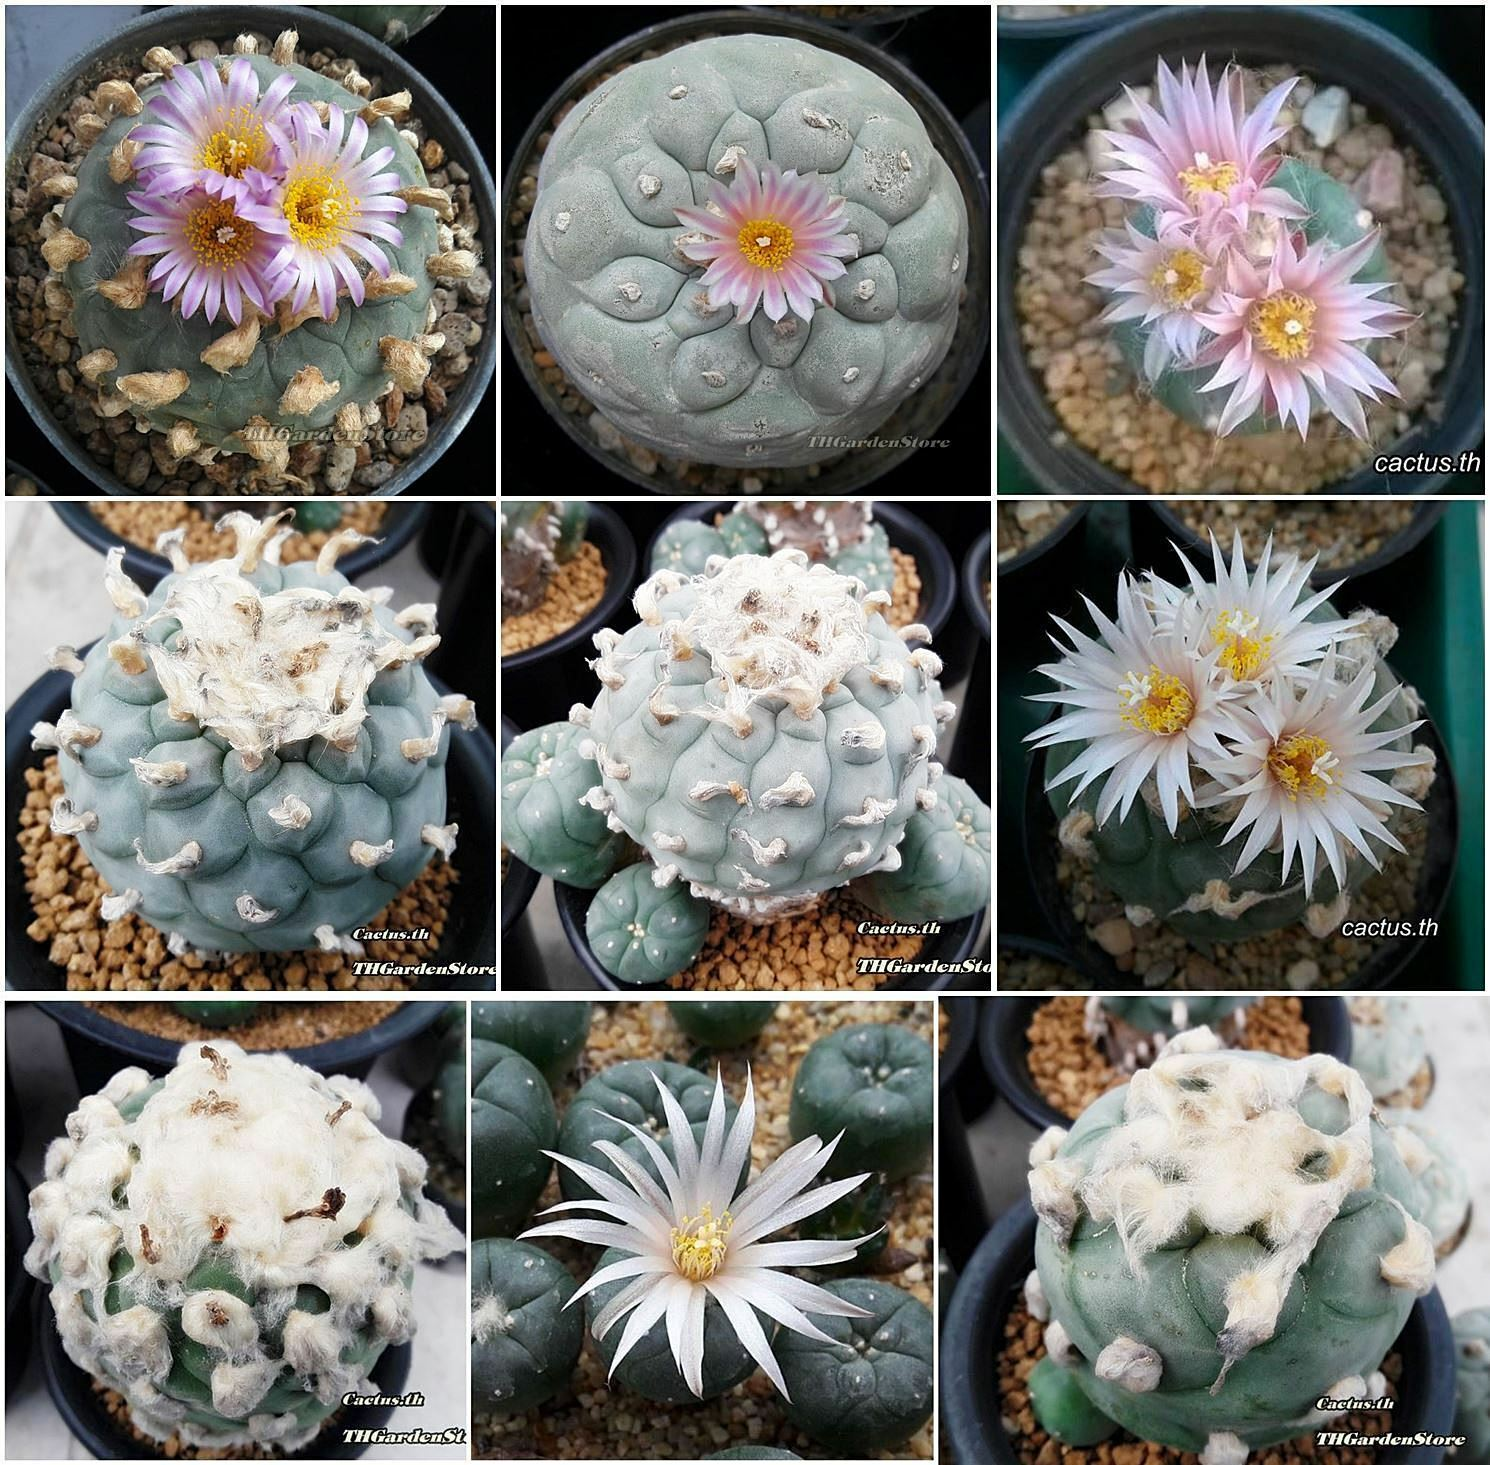 Rare Cyclamen Persian Seeds Winter Flower Potted Plants Home Garden Bonsai 2pcs